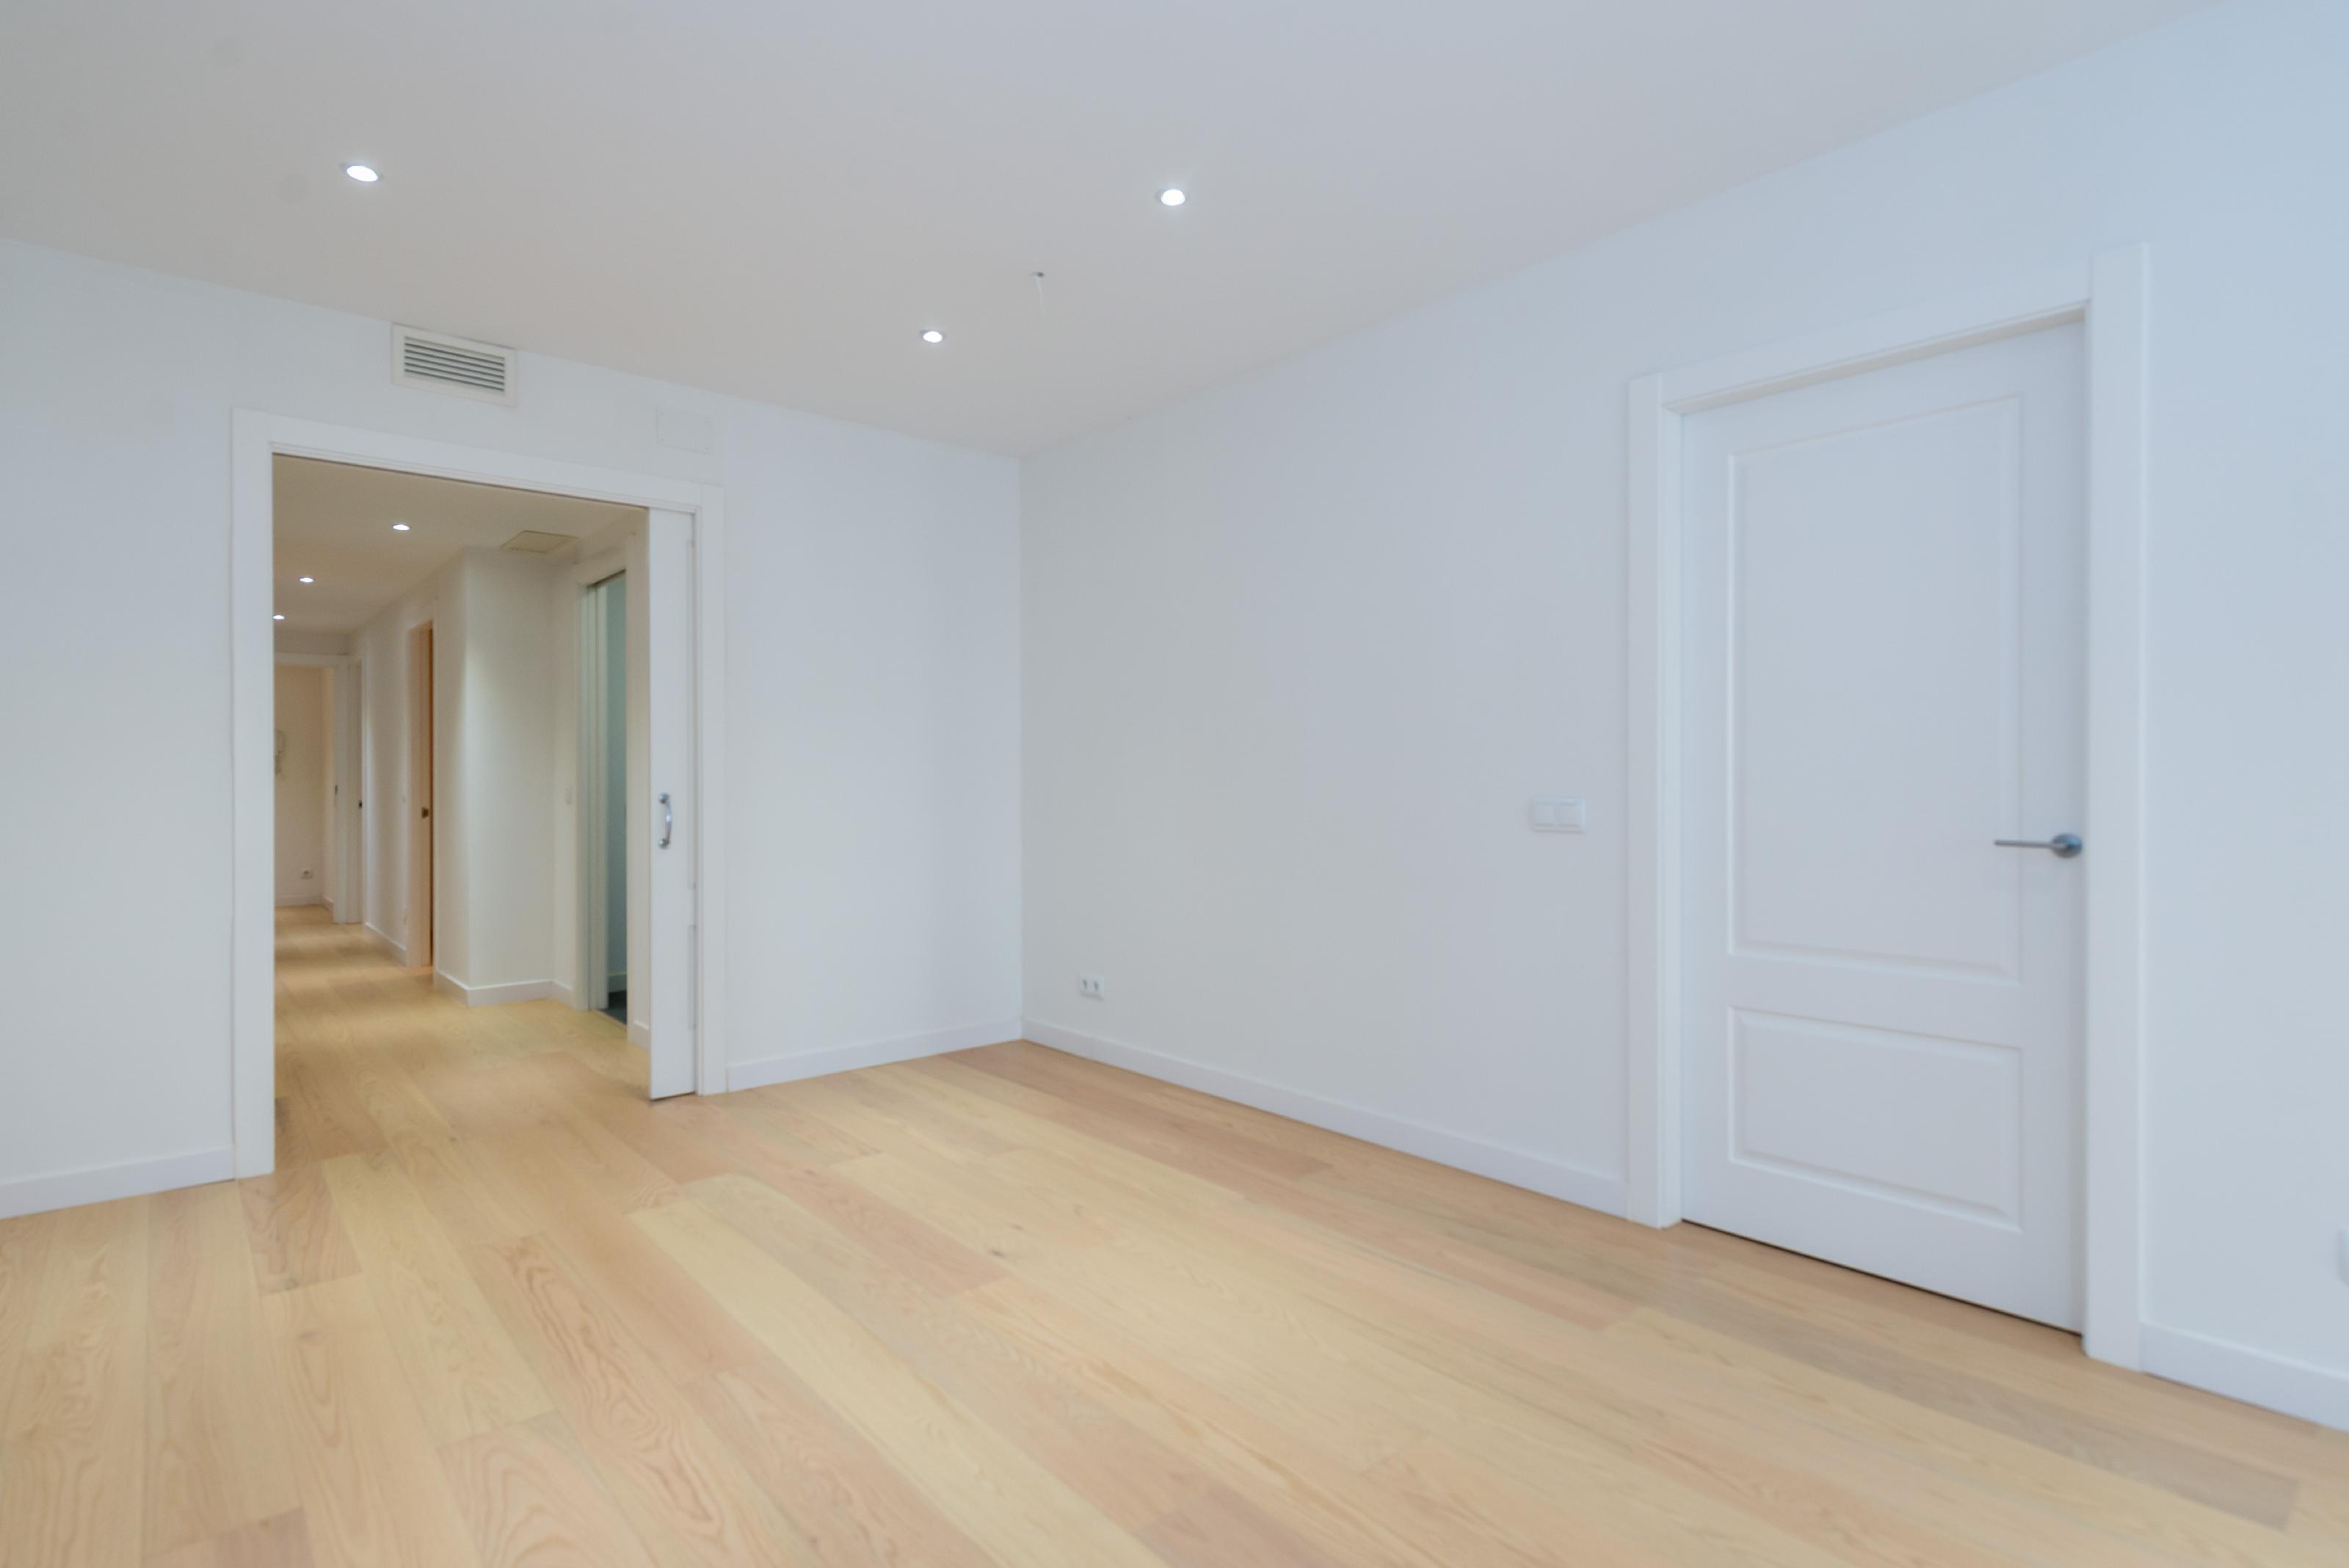 245231 Flat for sale in Sarrià-Sant Gervasi, Sant Gervasi-Galvany 9